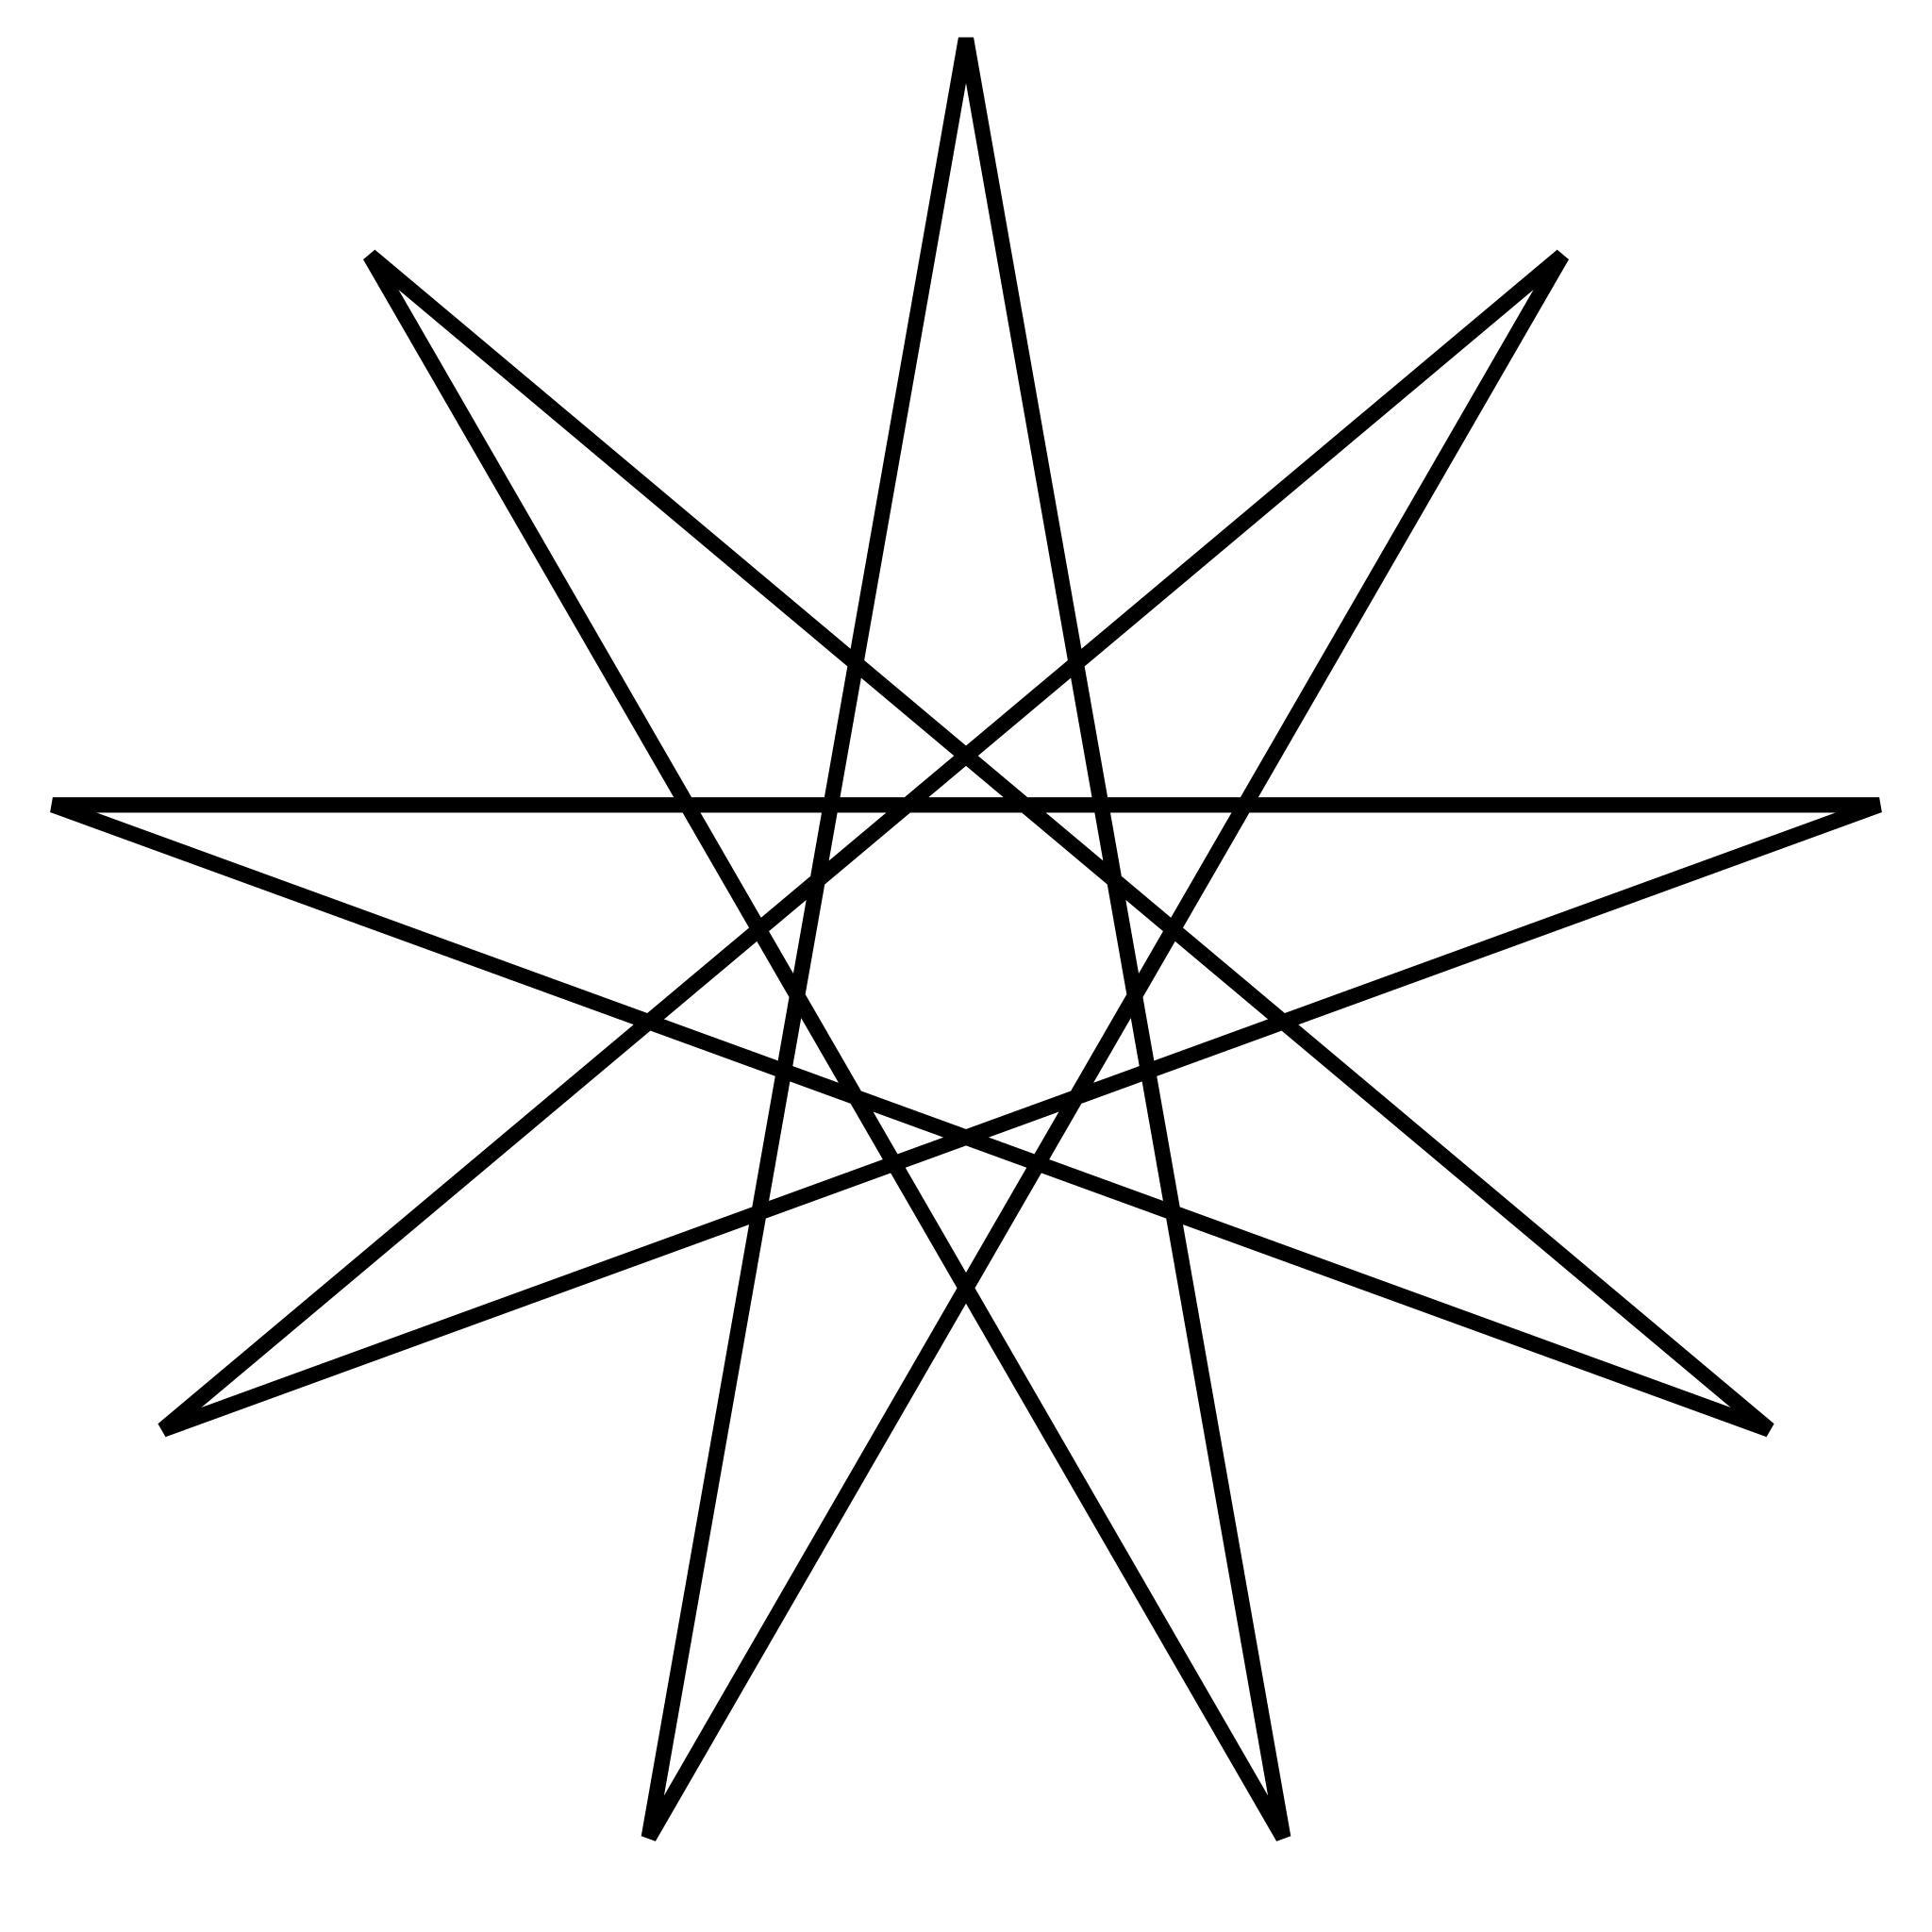 эскиз тату звезды